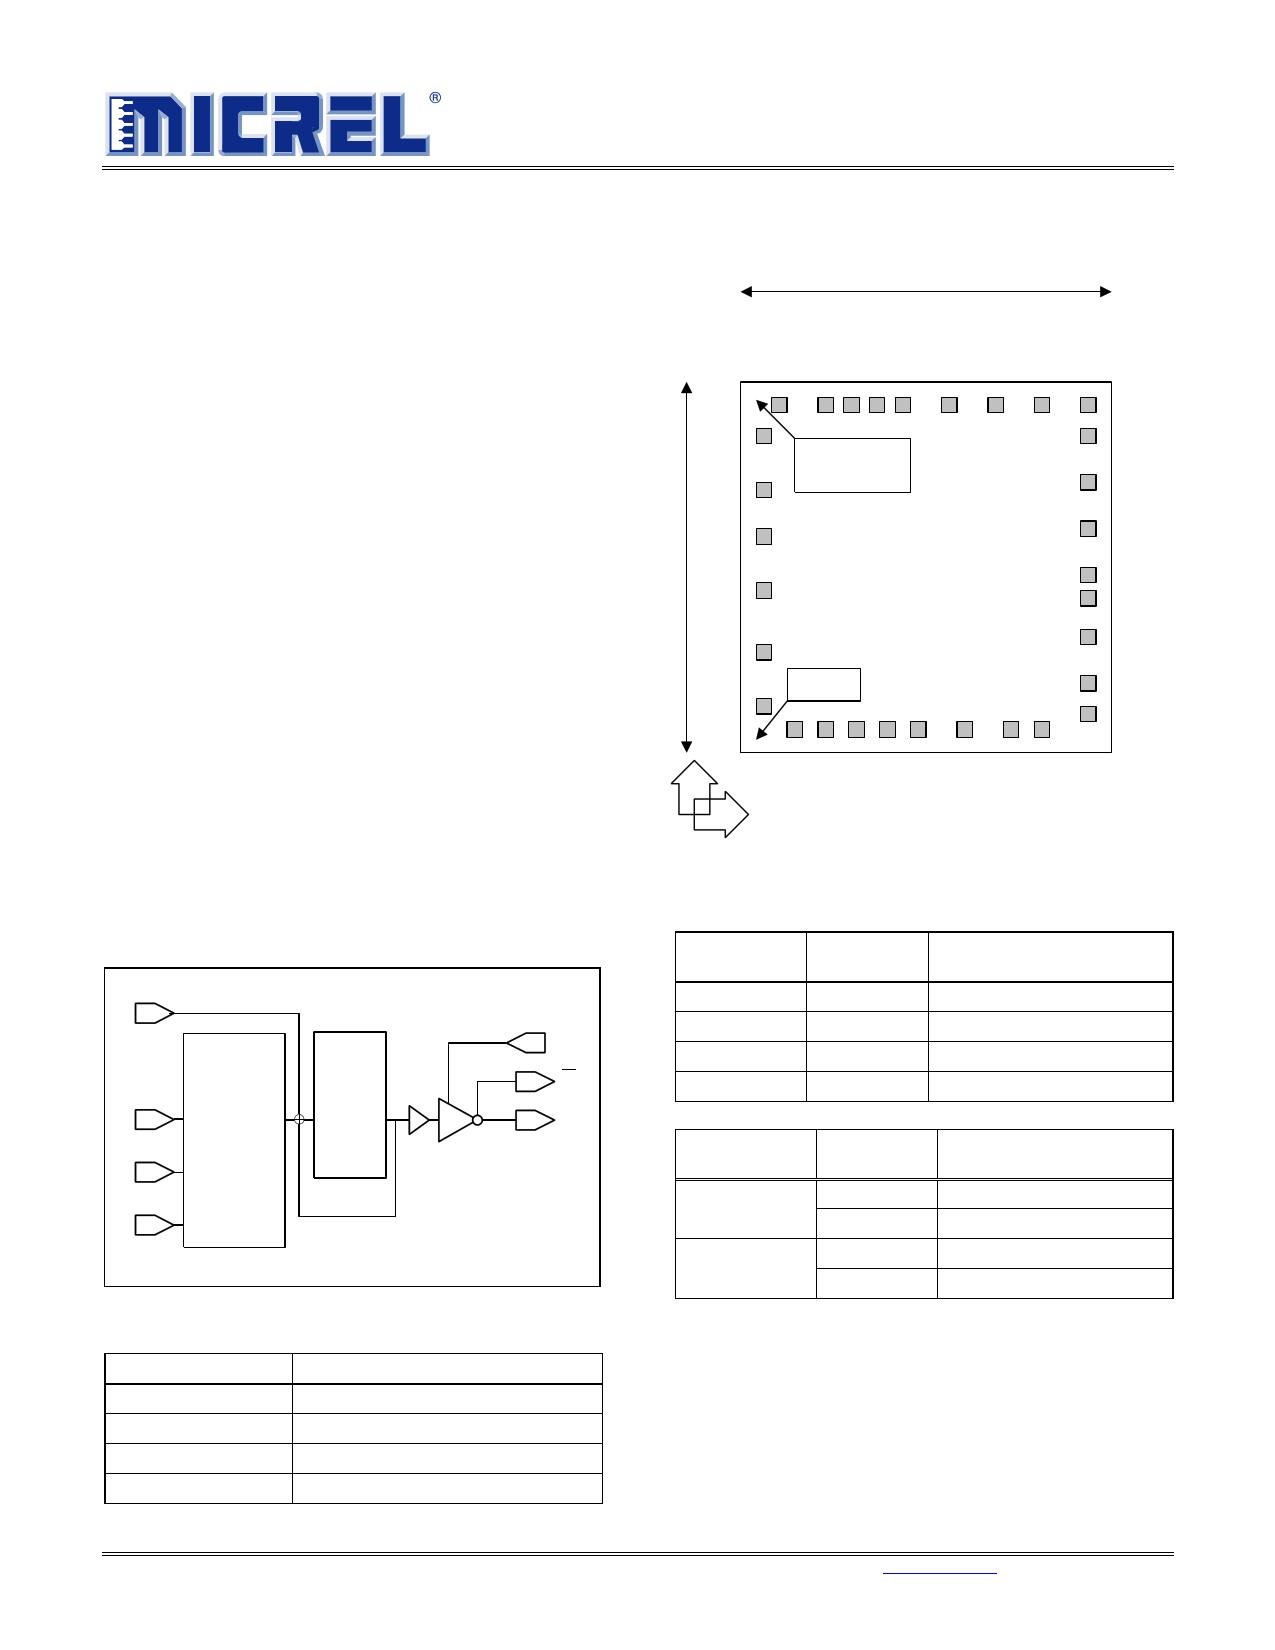 PL520-00 데이터시트 및 PL520-00 PDF